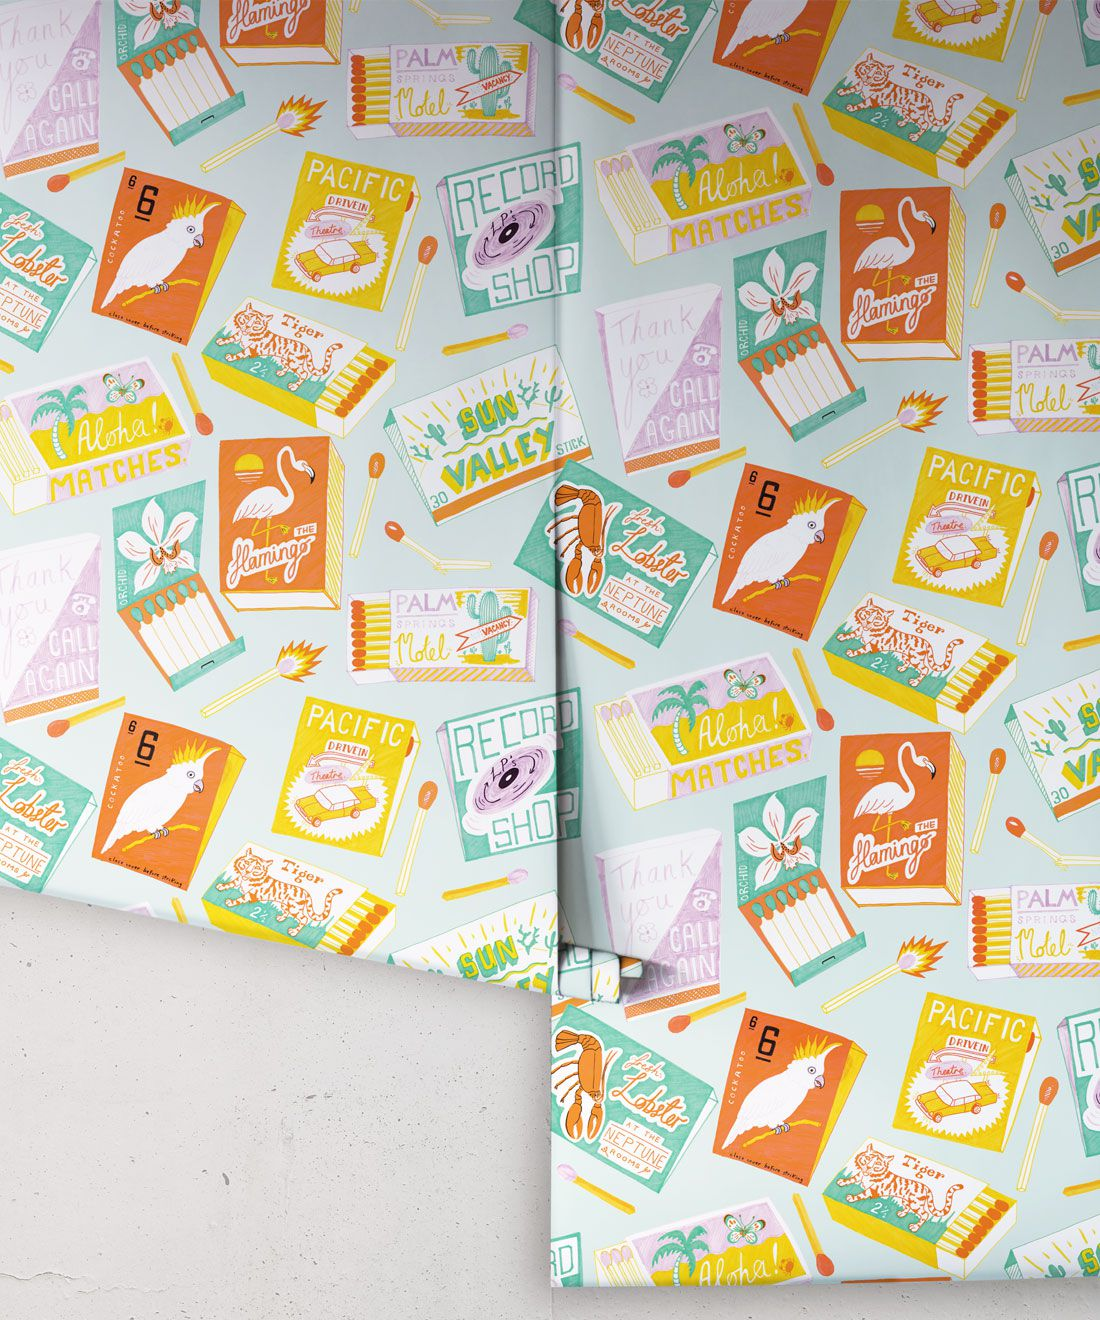 Match Books Wallpaper • retro wallpaper • las vegas style • gaming wallpaper • smokers wallpaper • fire rolls